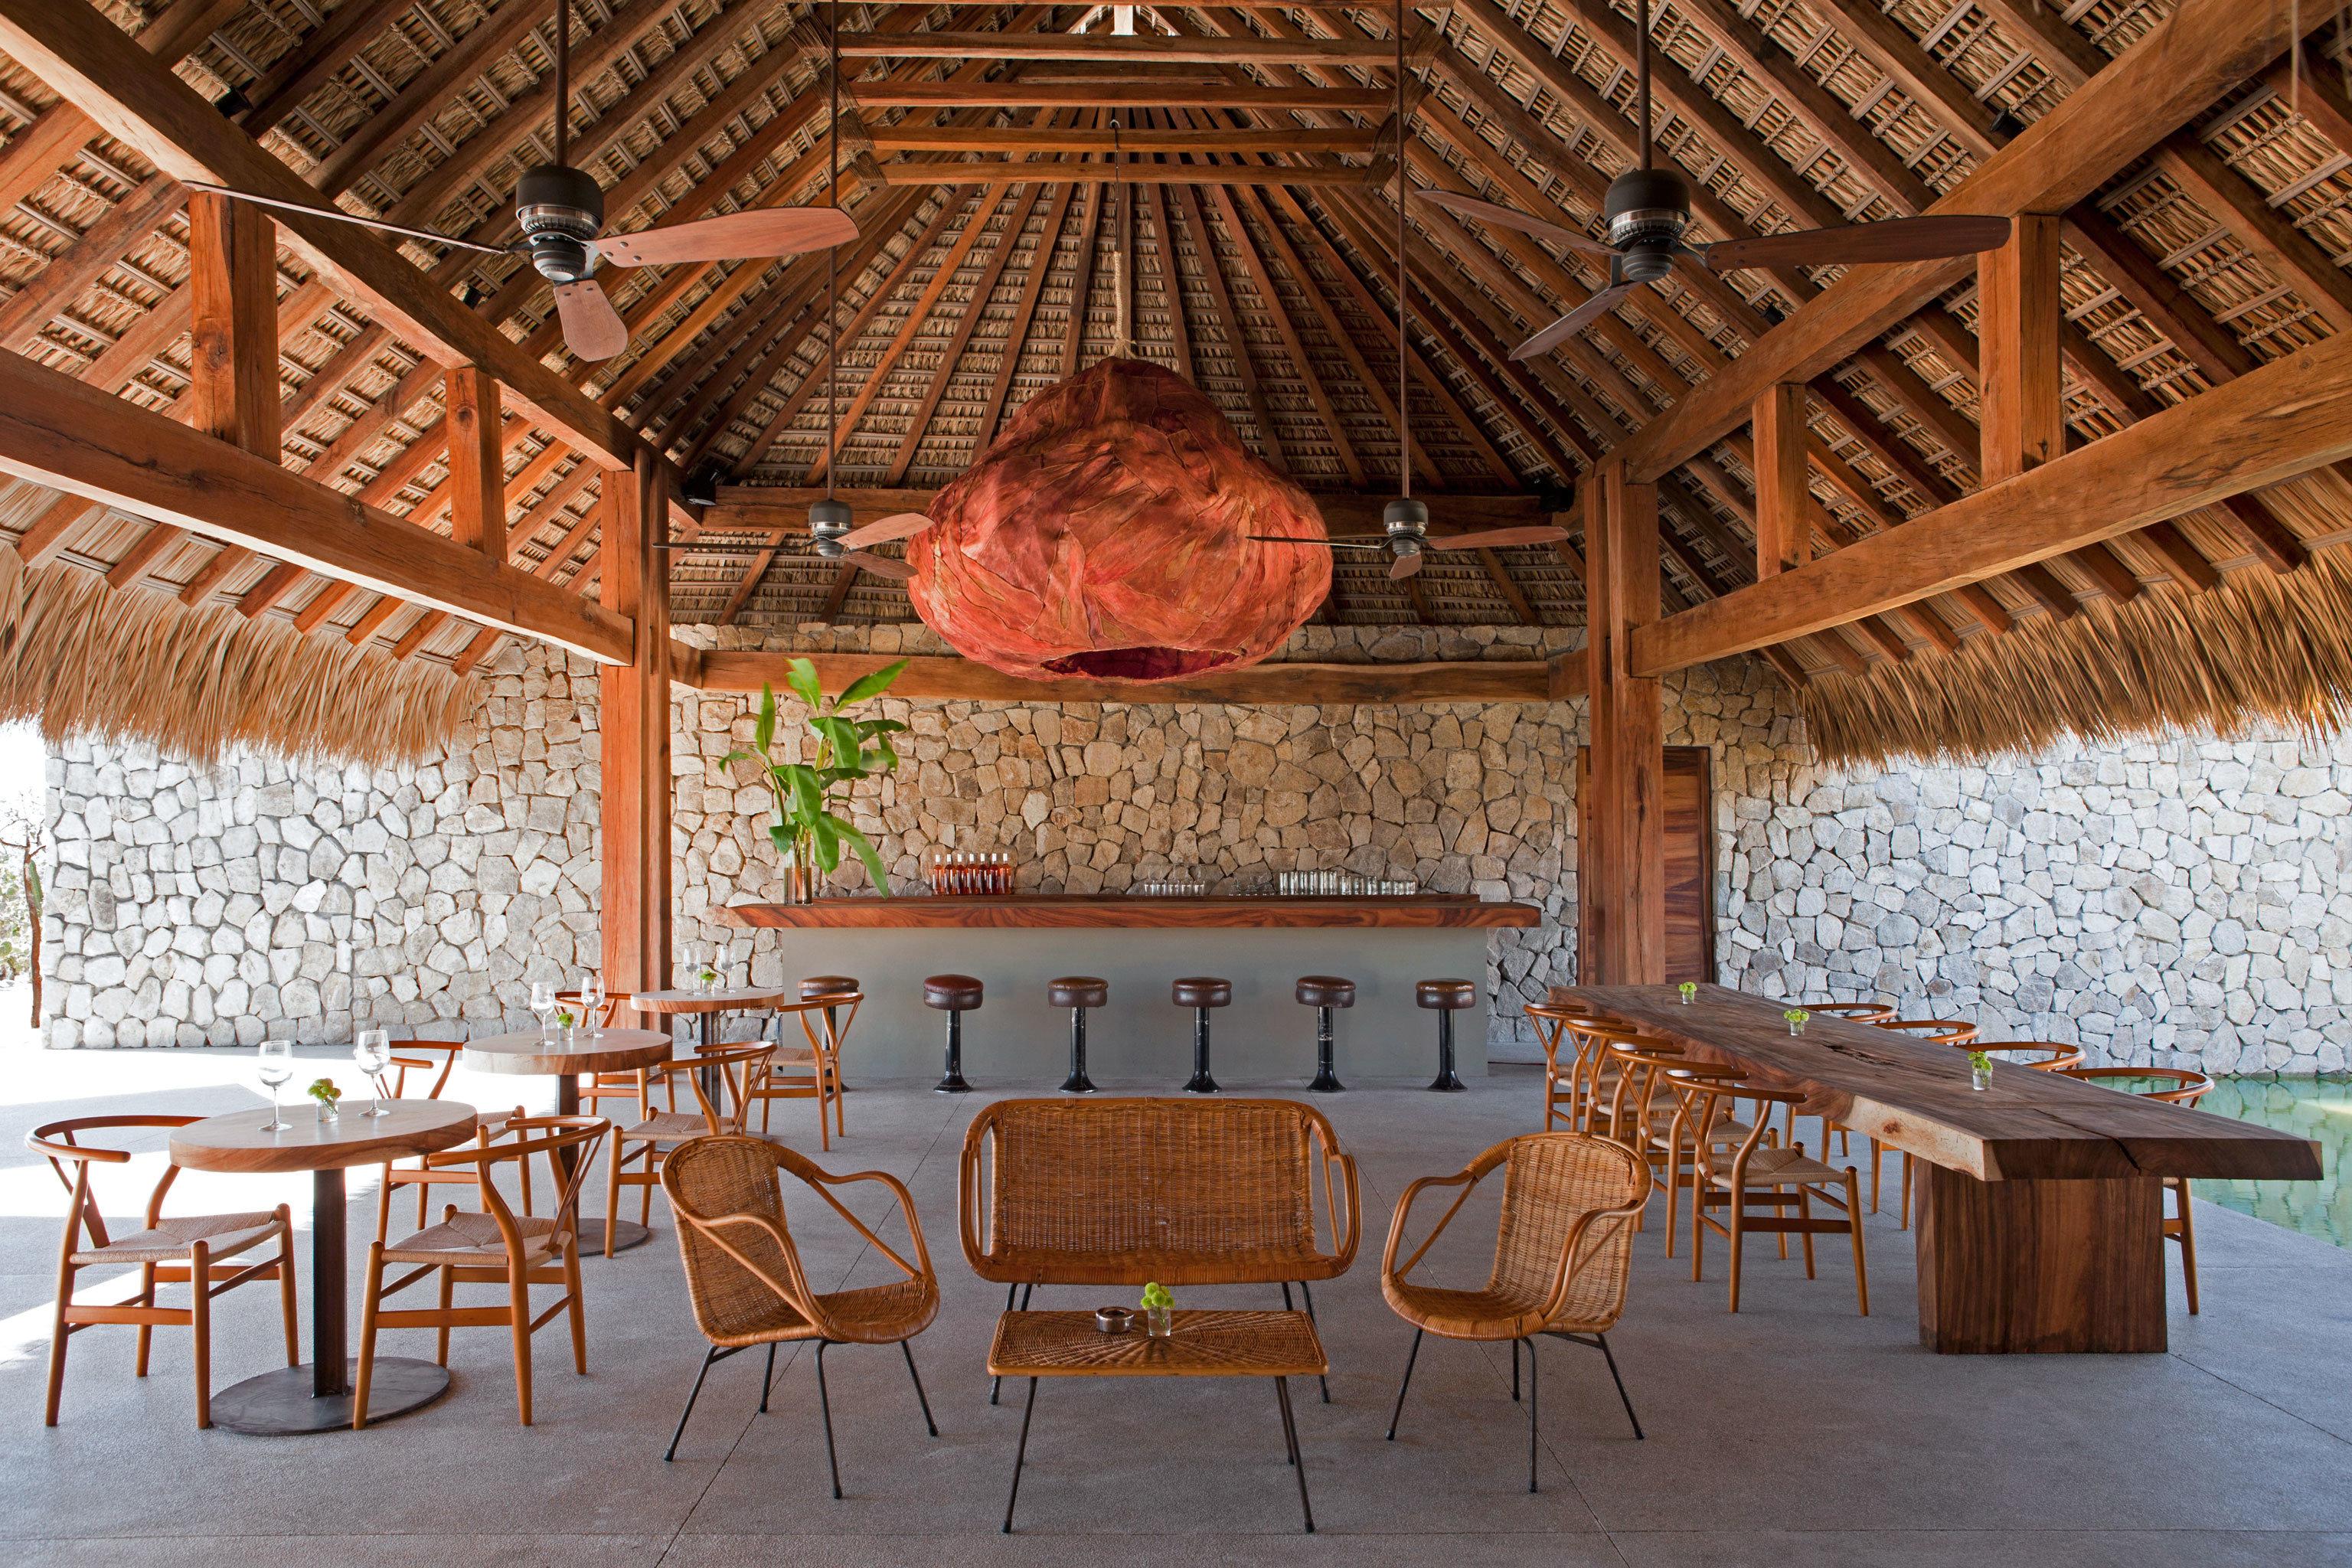 Bar Drink Eat Hotels Scenic views chair floor room property estate wood restaurant cottage interior design farmhouse log cabin barn